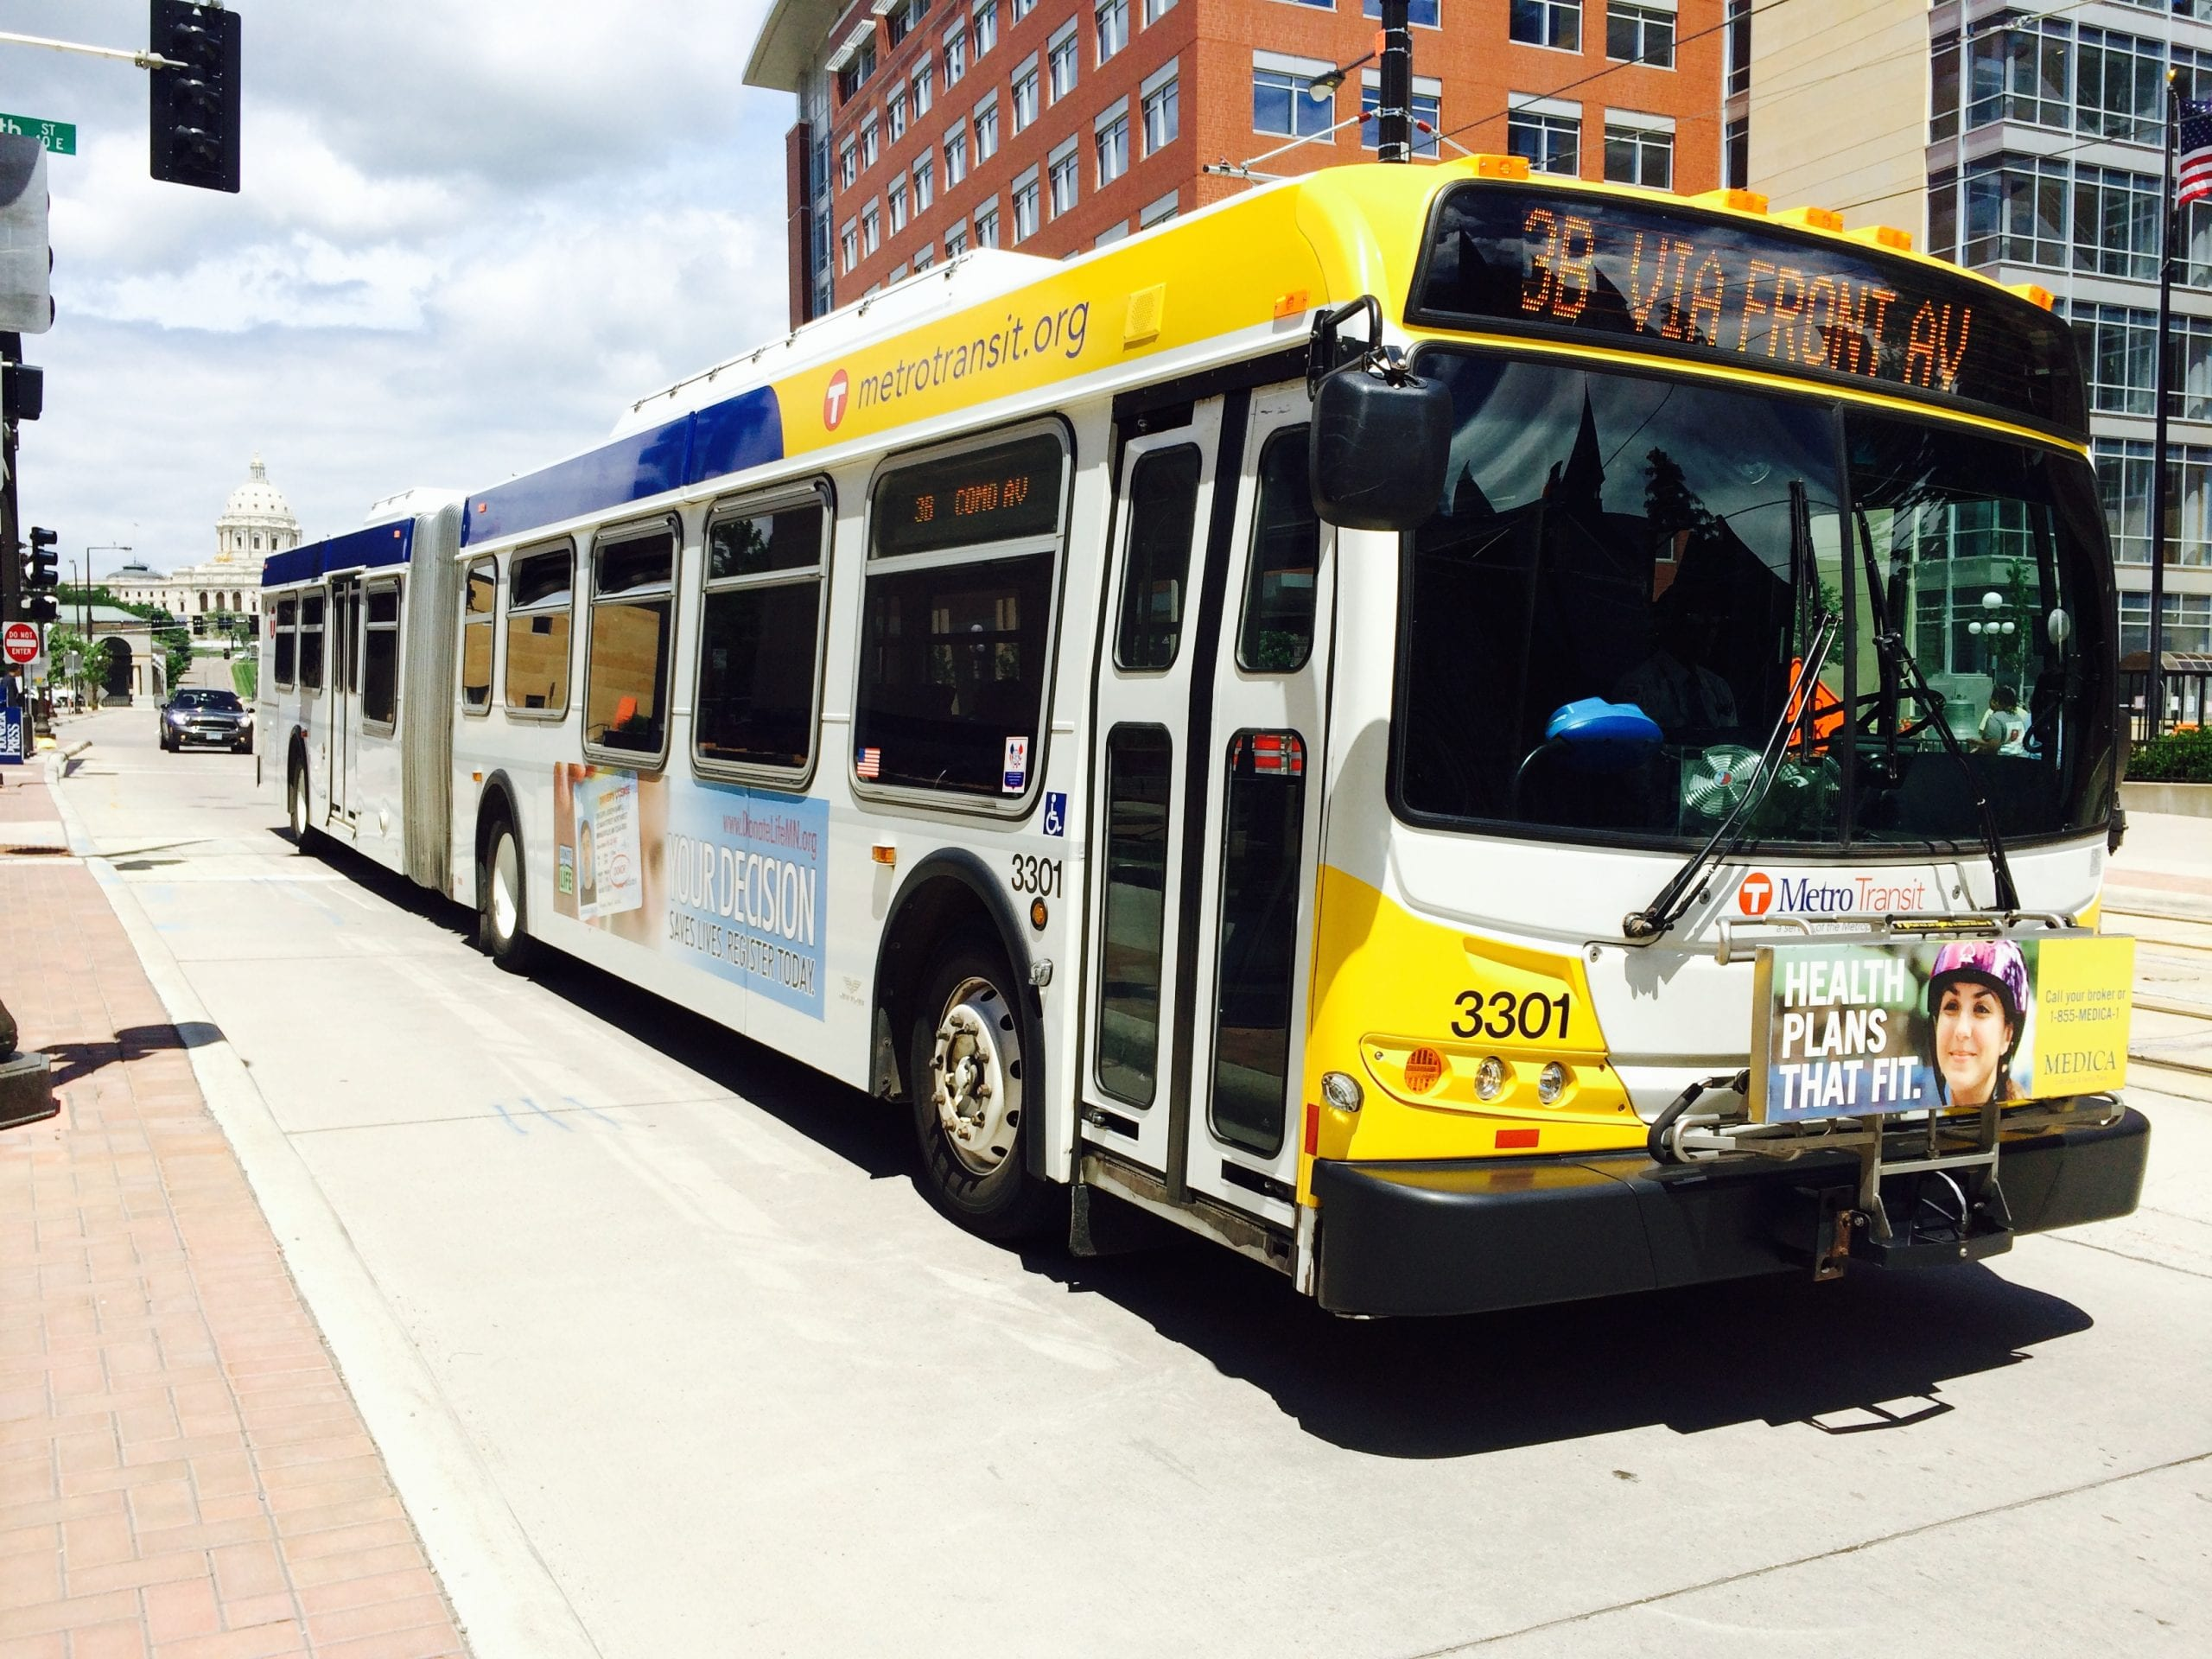 Metro Transit bus in downtown Saint Paul. (Photo: Joseph Lemon/Metro)